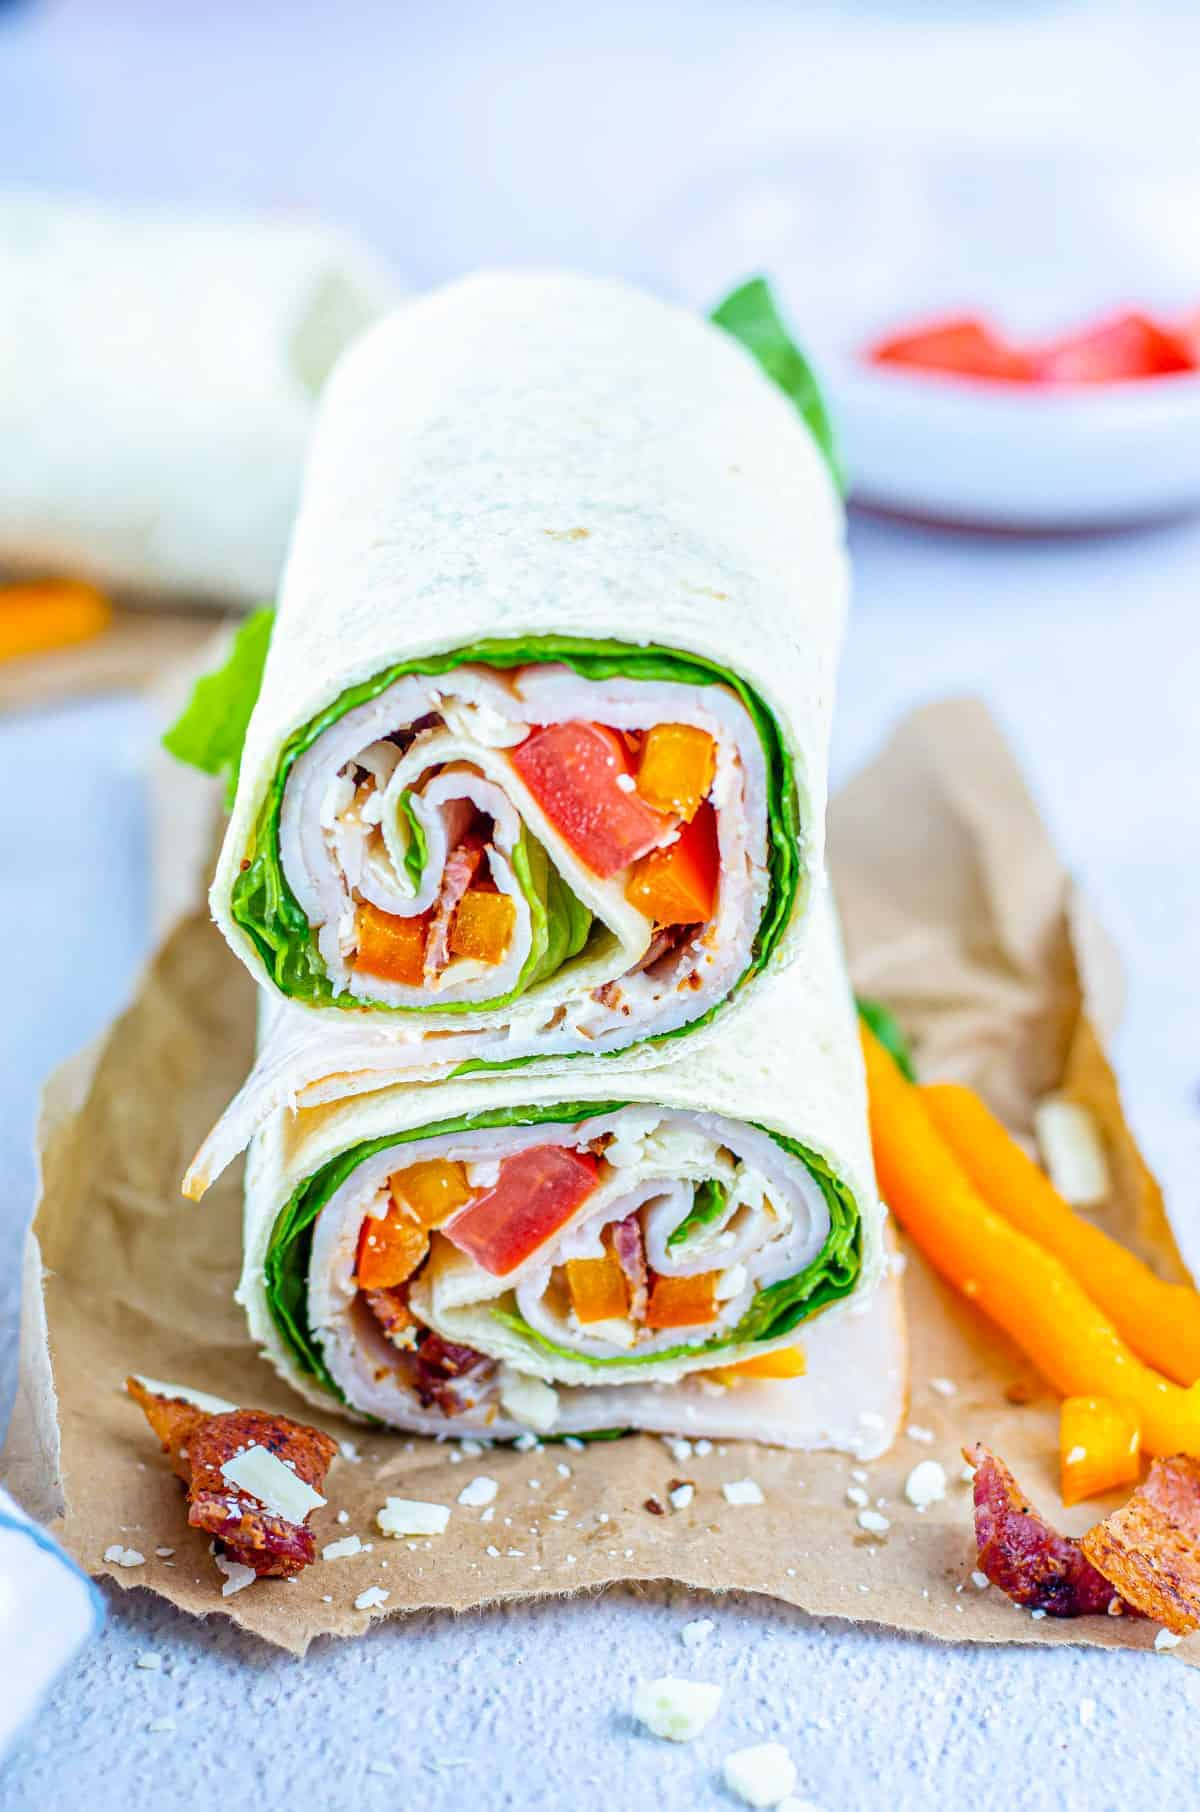 11 School Lunch Ideas Your Kids Will Love | kimschob.com